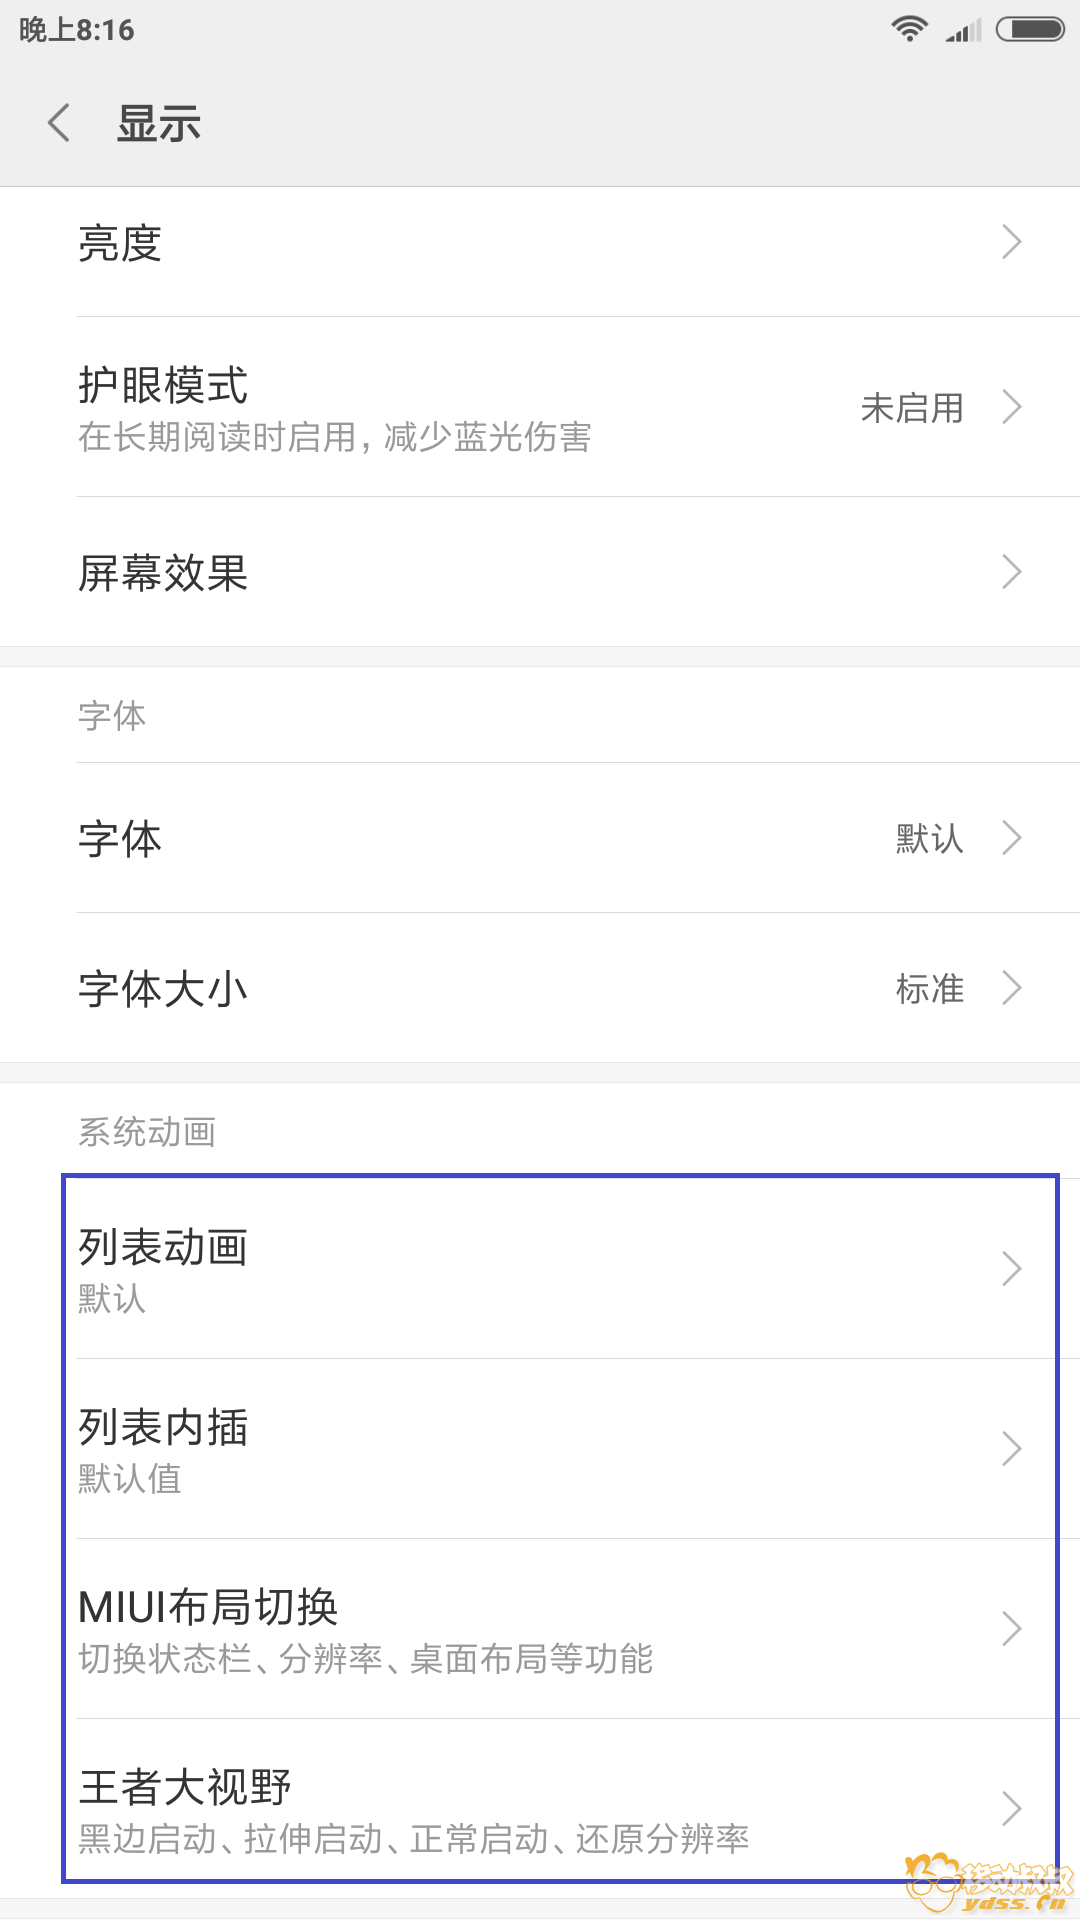 Screenshot_2018-02-28-20-16-02-927_com.android.settings.png